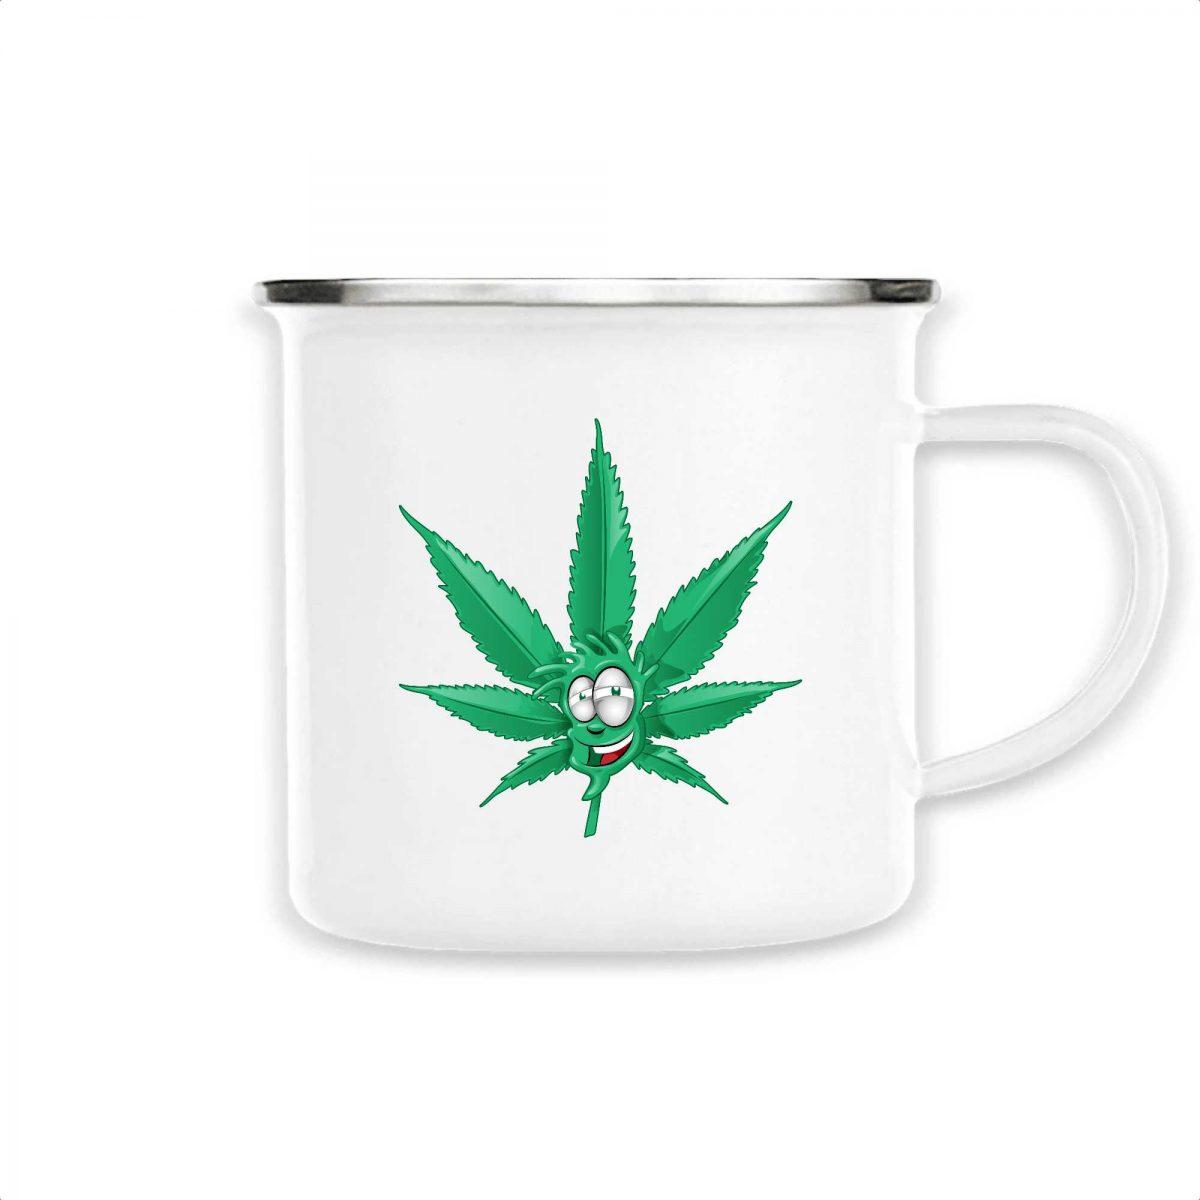 Mug émaillé Made In Chanvre - Feuille de Cannabis